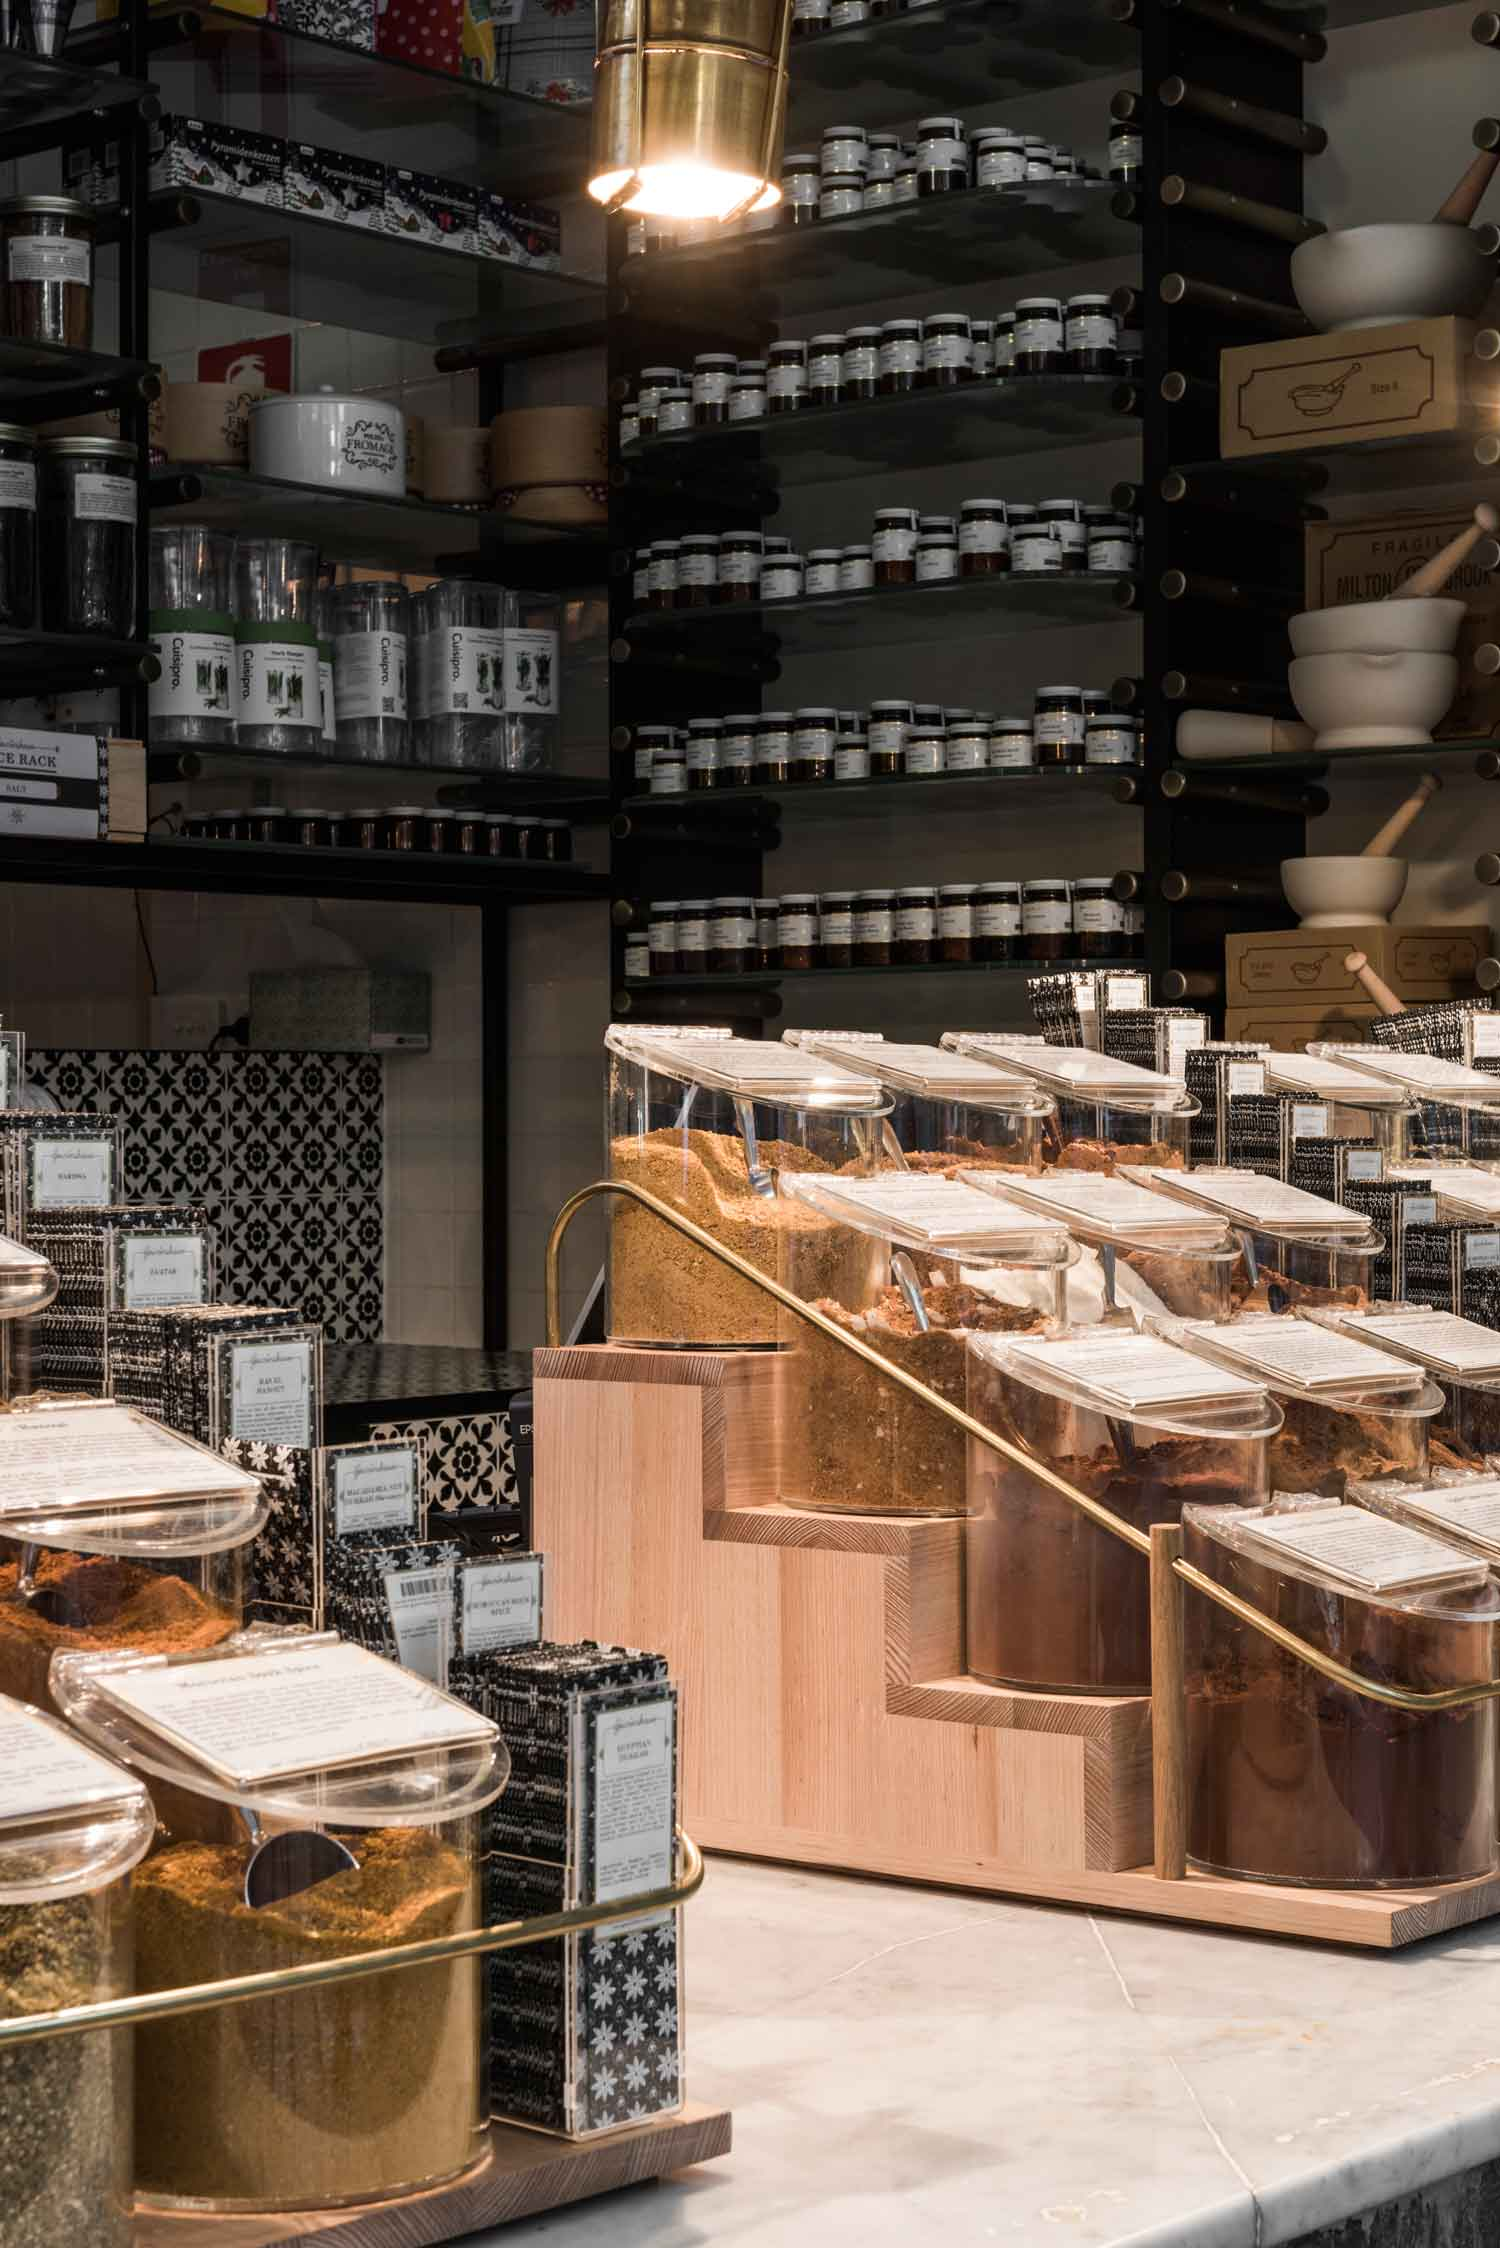 Gewurzhaus Merchants Stores By Doherty Design Studio